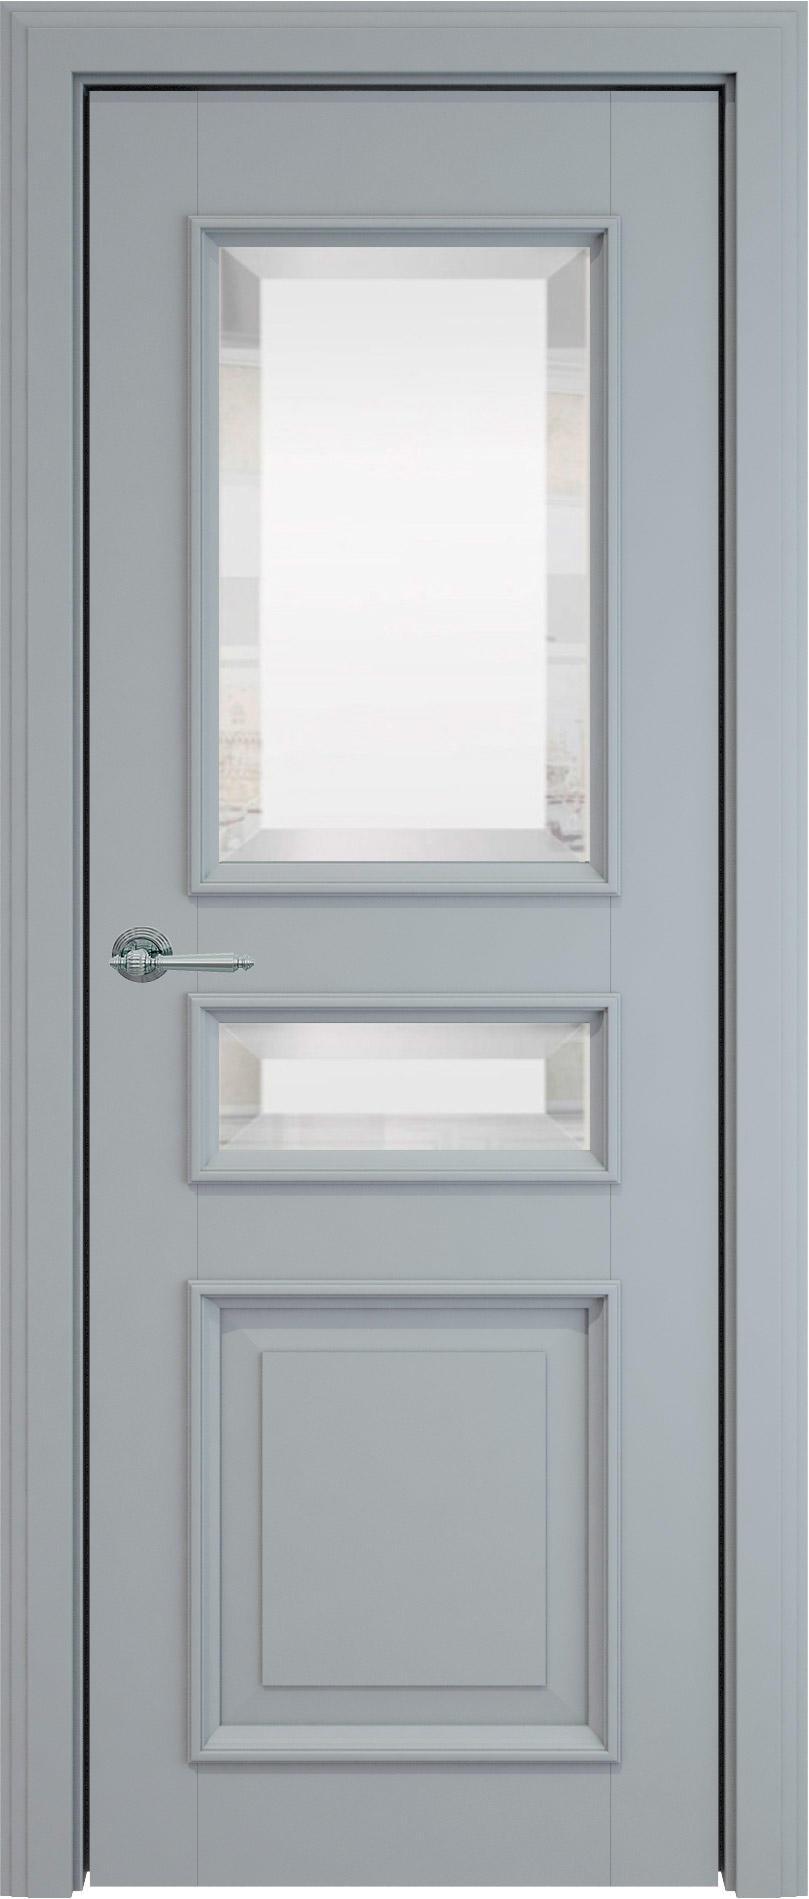 Imperia-R LUX цвет - Серебристо-серая эмаль (RAL 7045) Со стеклом (ДО)